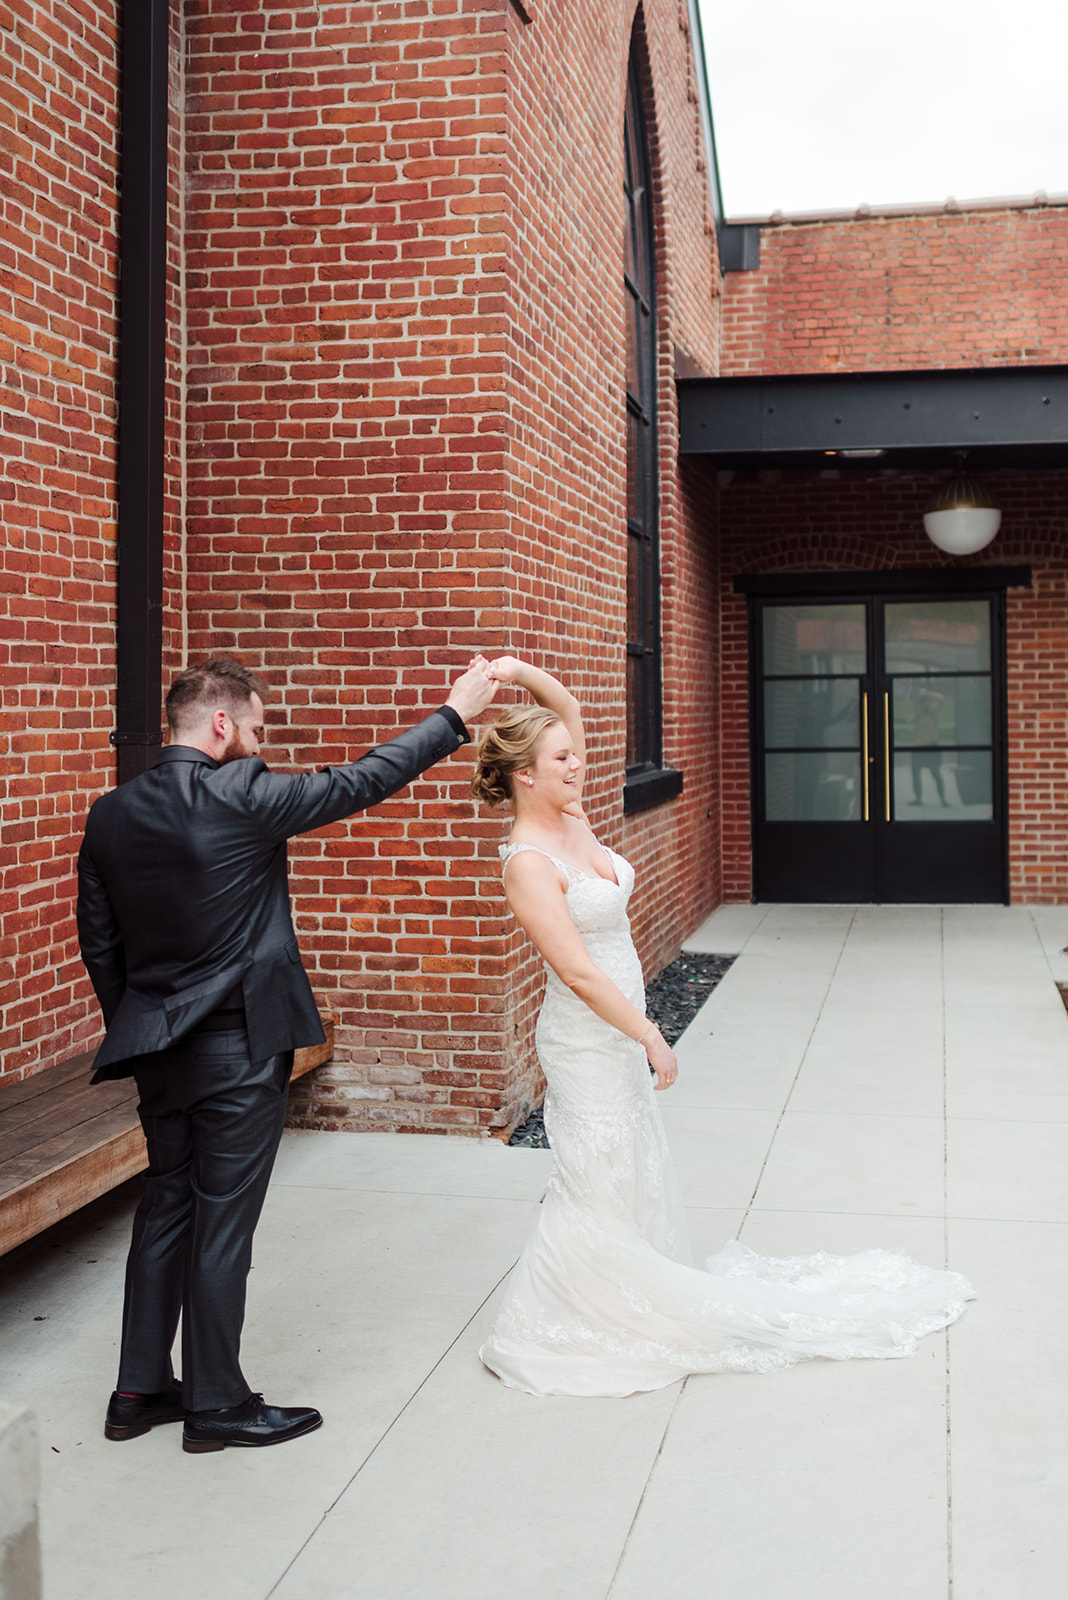 Wedding photography: Nashville wedding at Clementine featured on Nashville Bride Guide